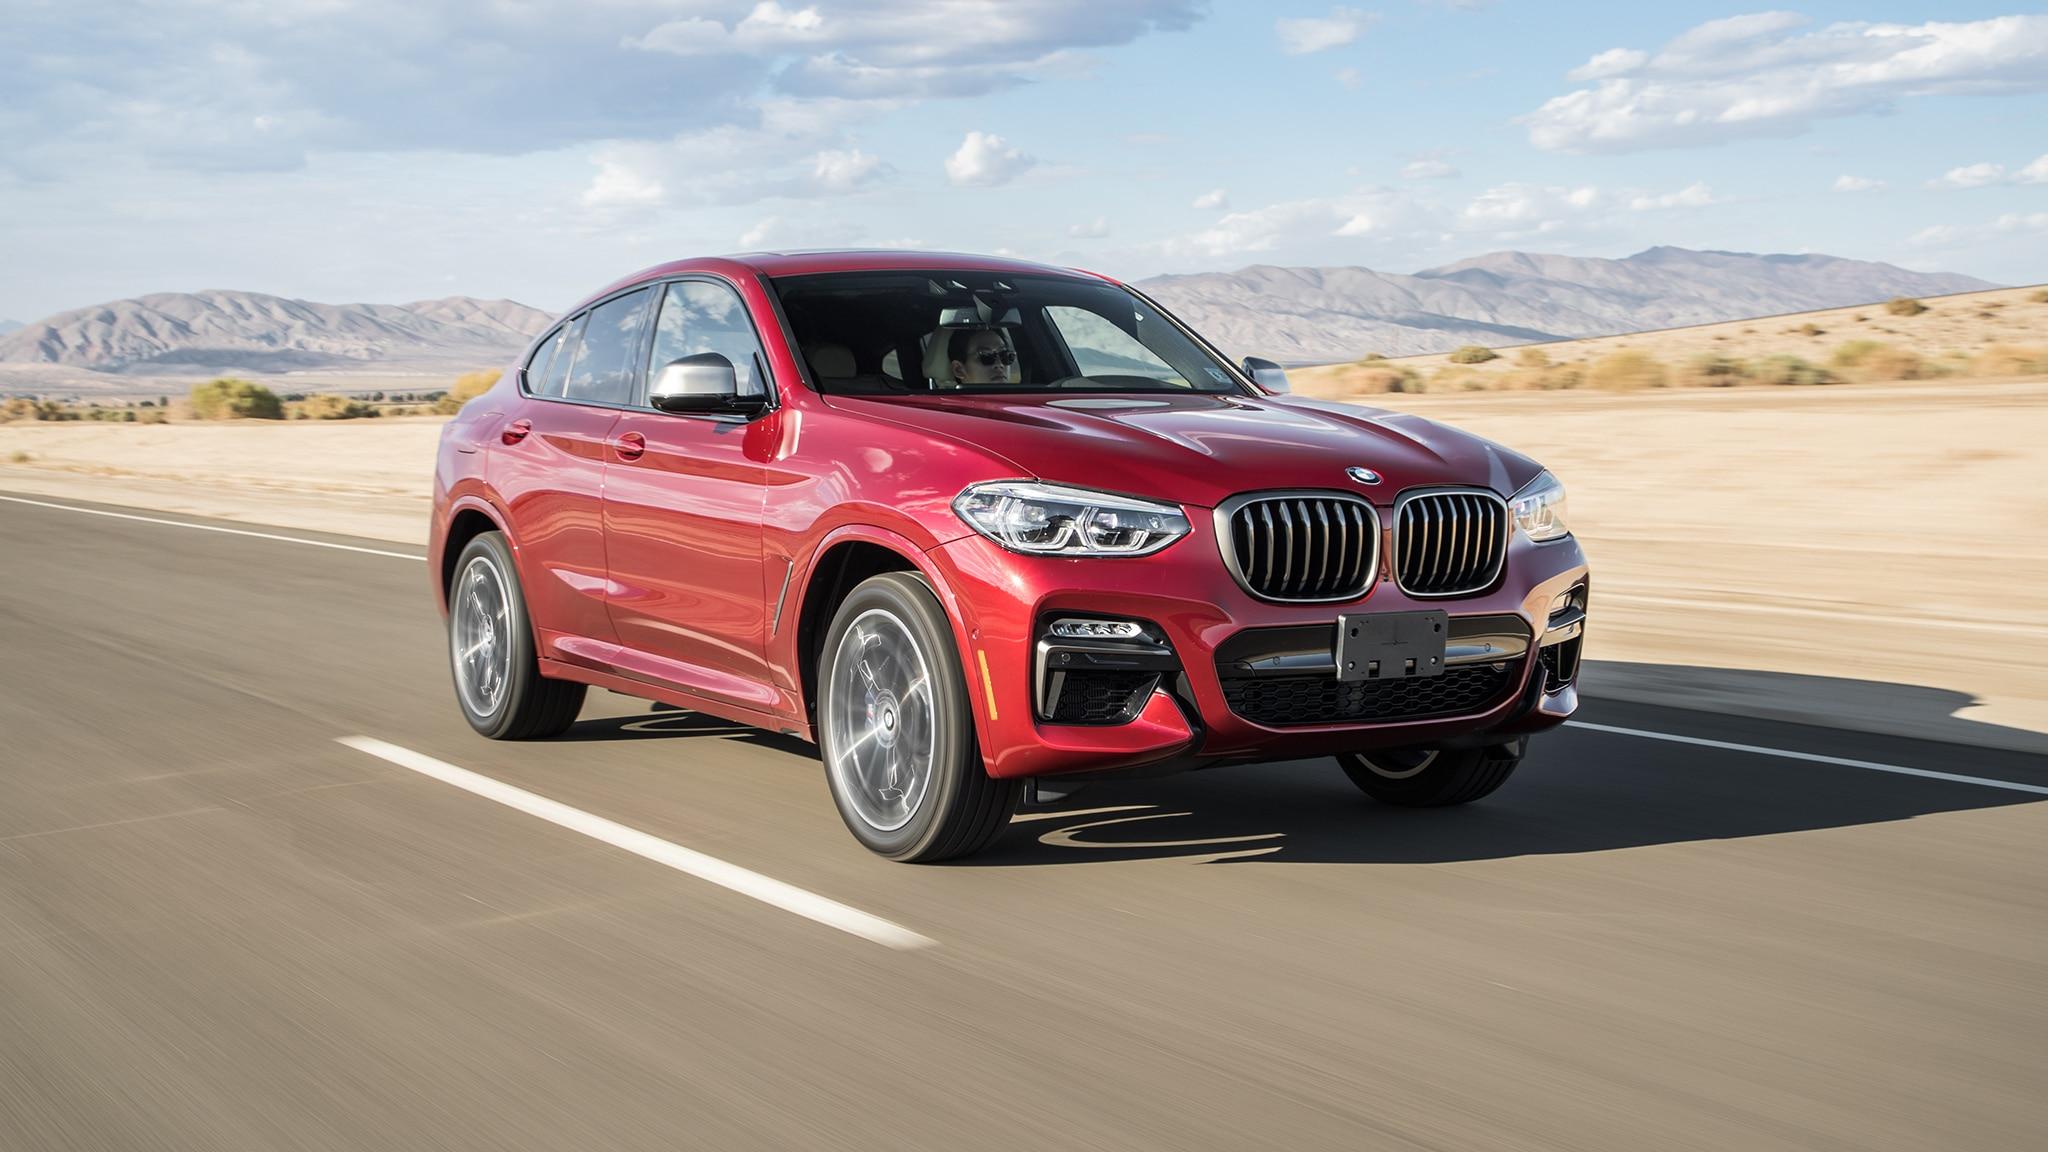 2019 BMW X4 M40i Front Three Quarter In Motion 1